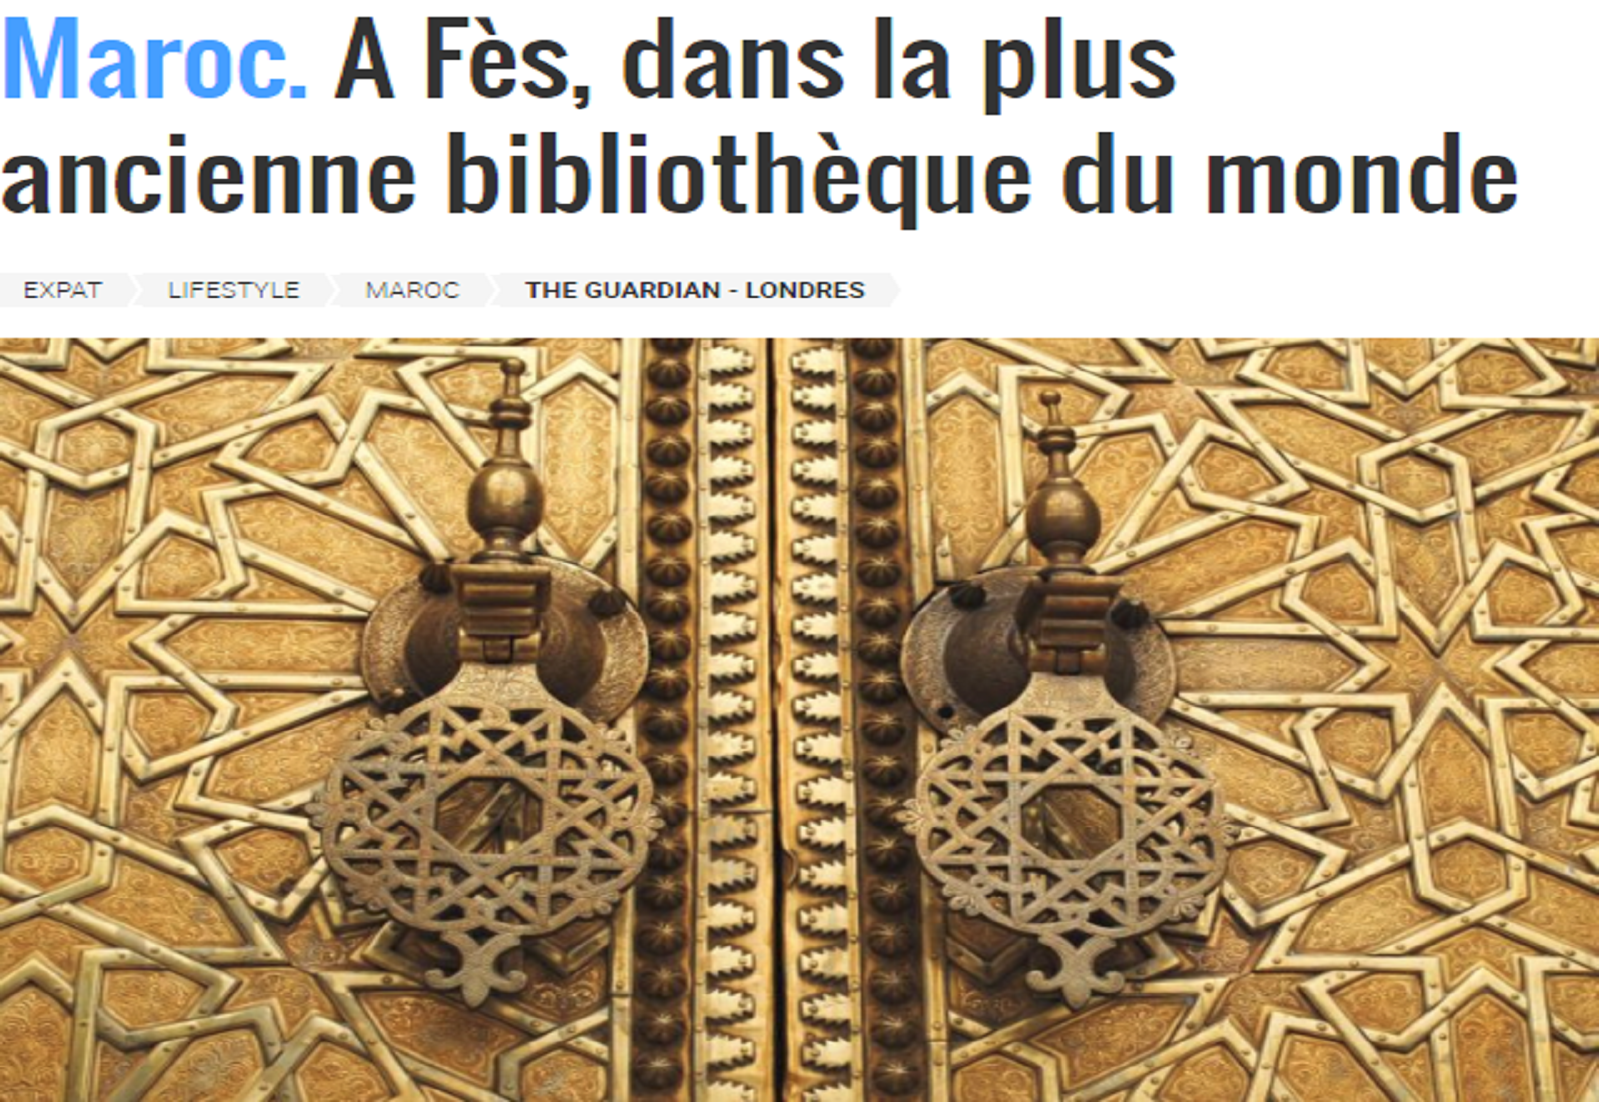 http://www.lecentreculturelmarocain.ca/wp-content/uploads/2016/11/fès-Maroc.png